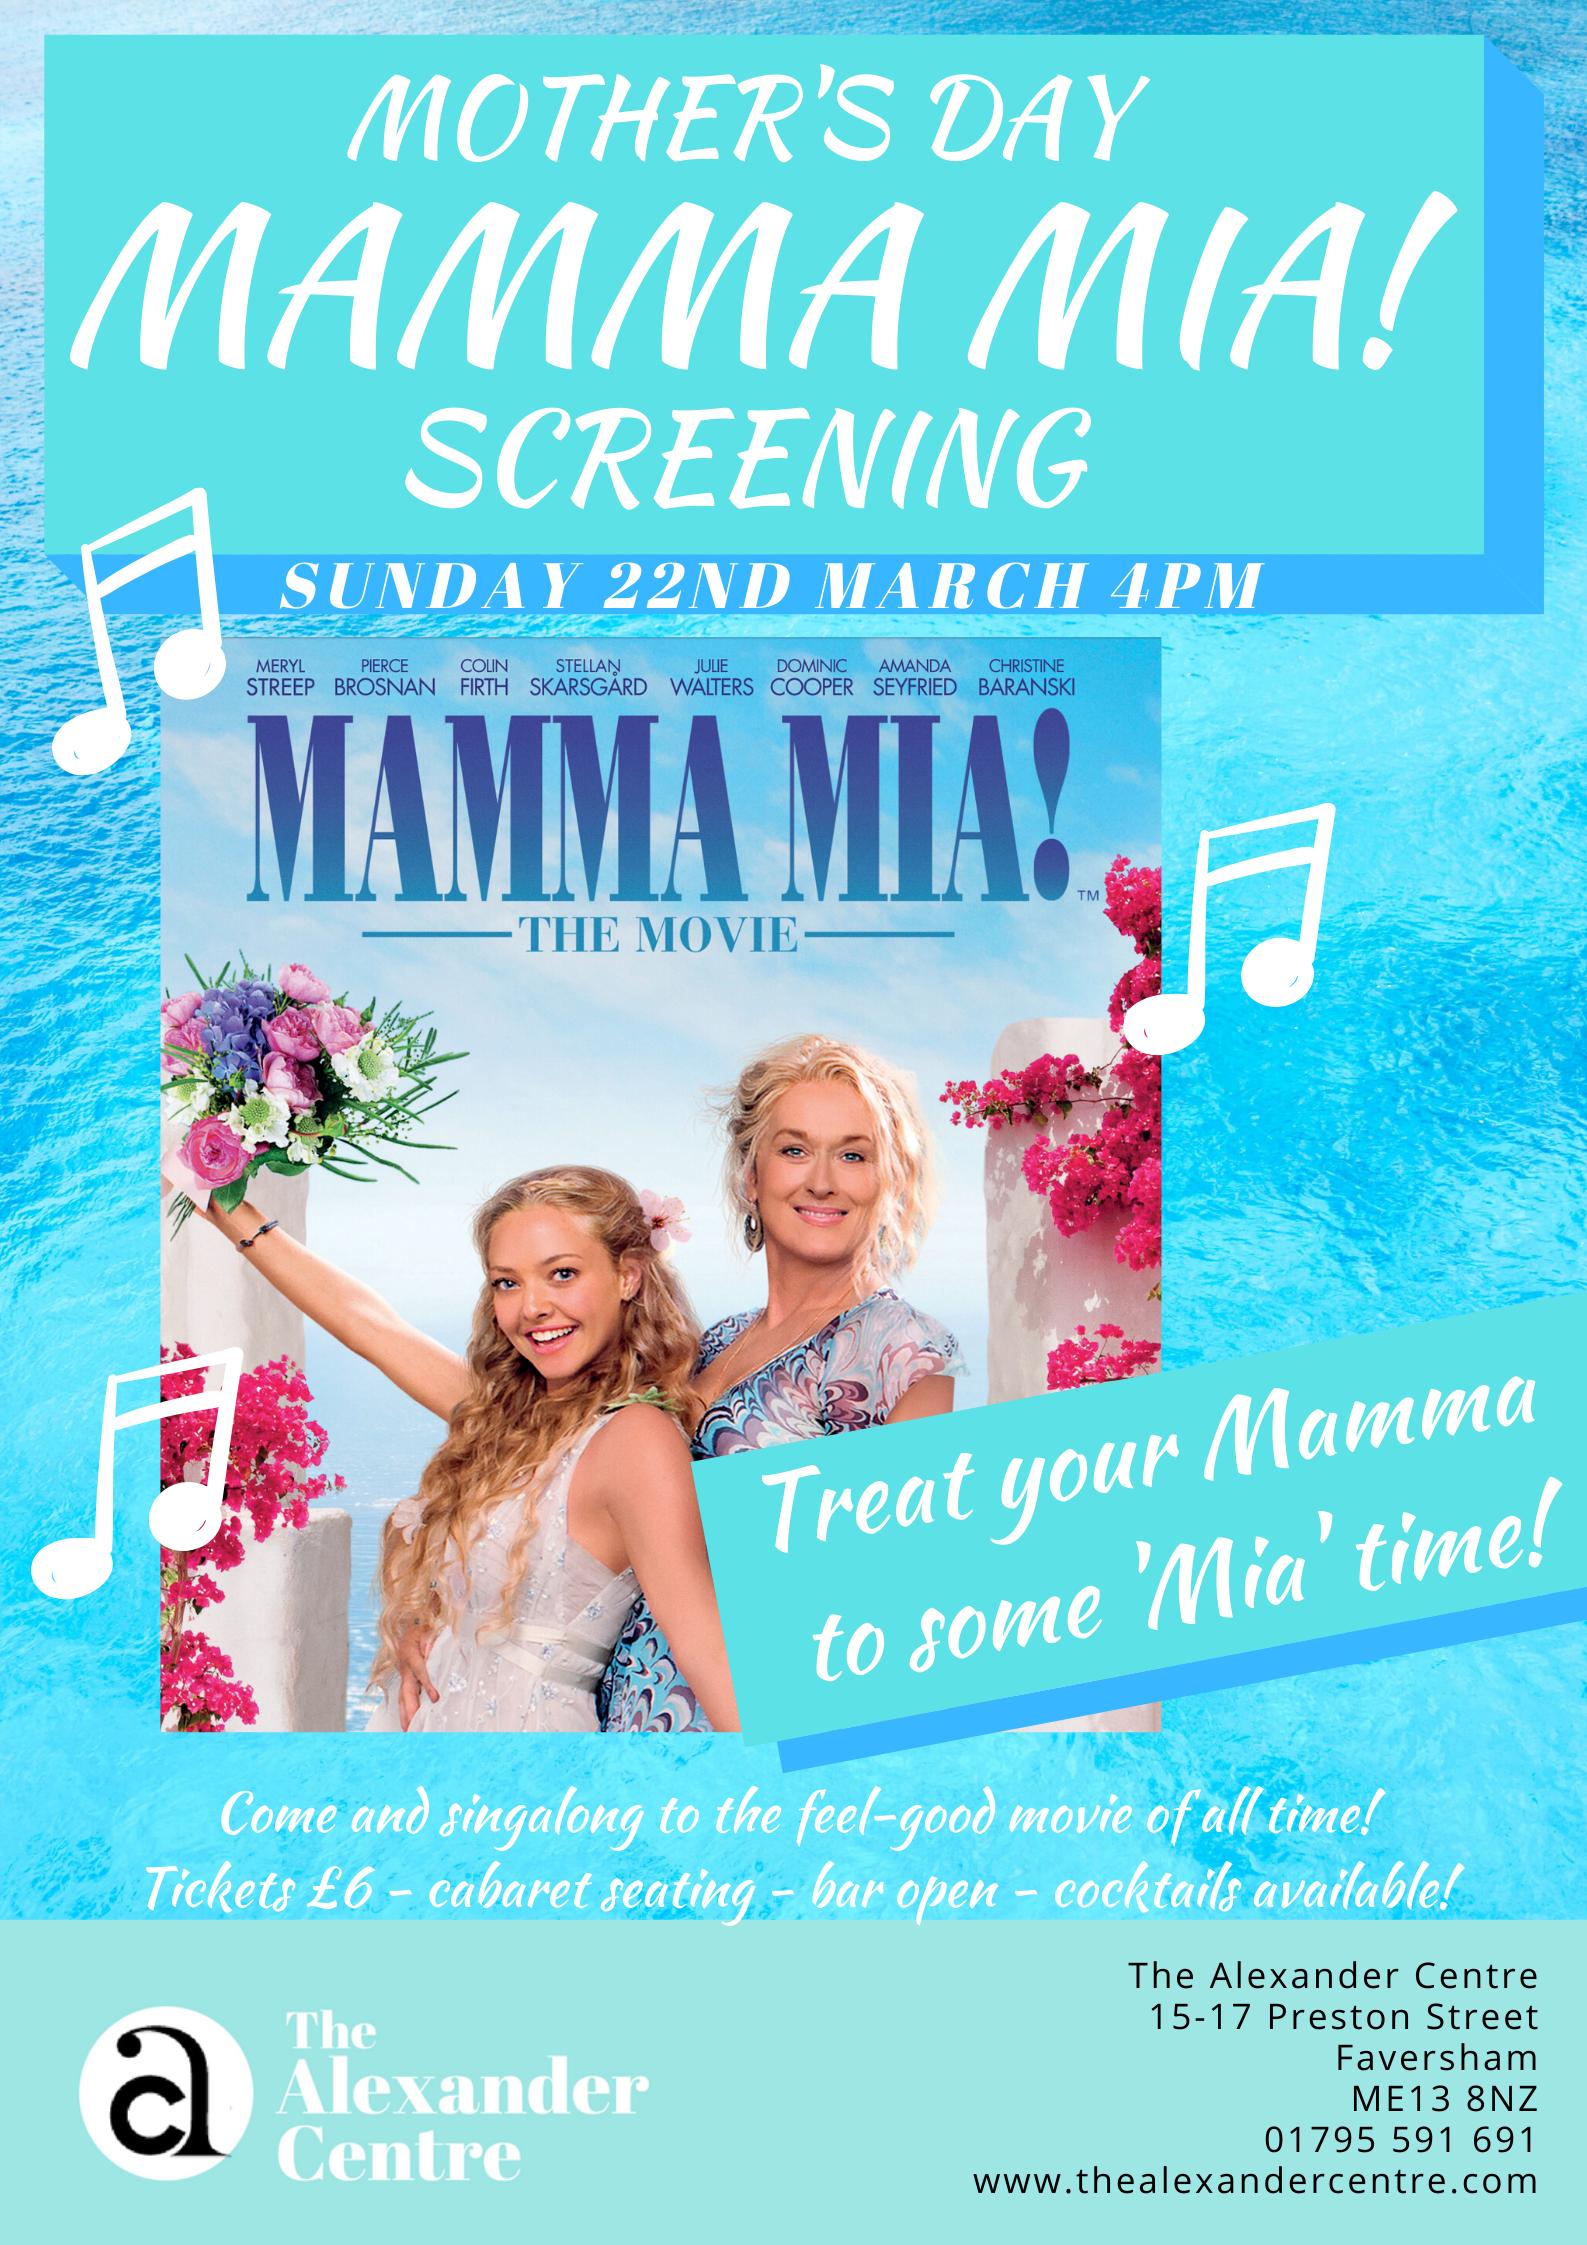 Mamma Mia! - Mother's Day Screening